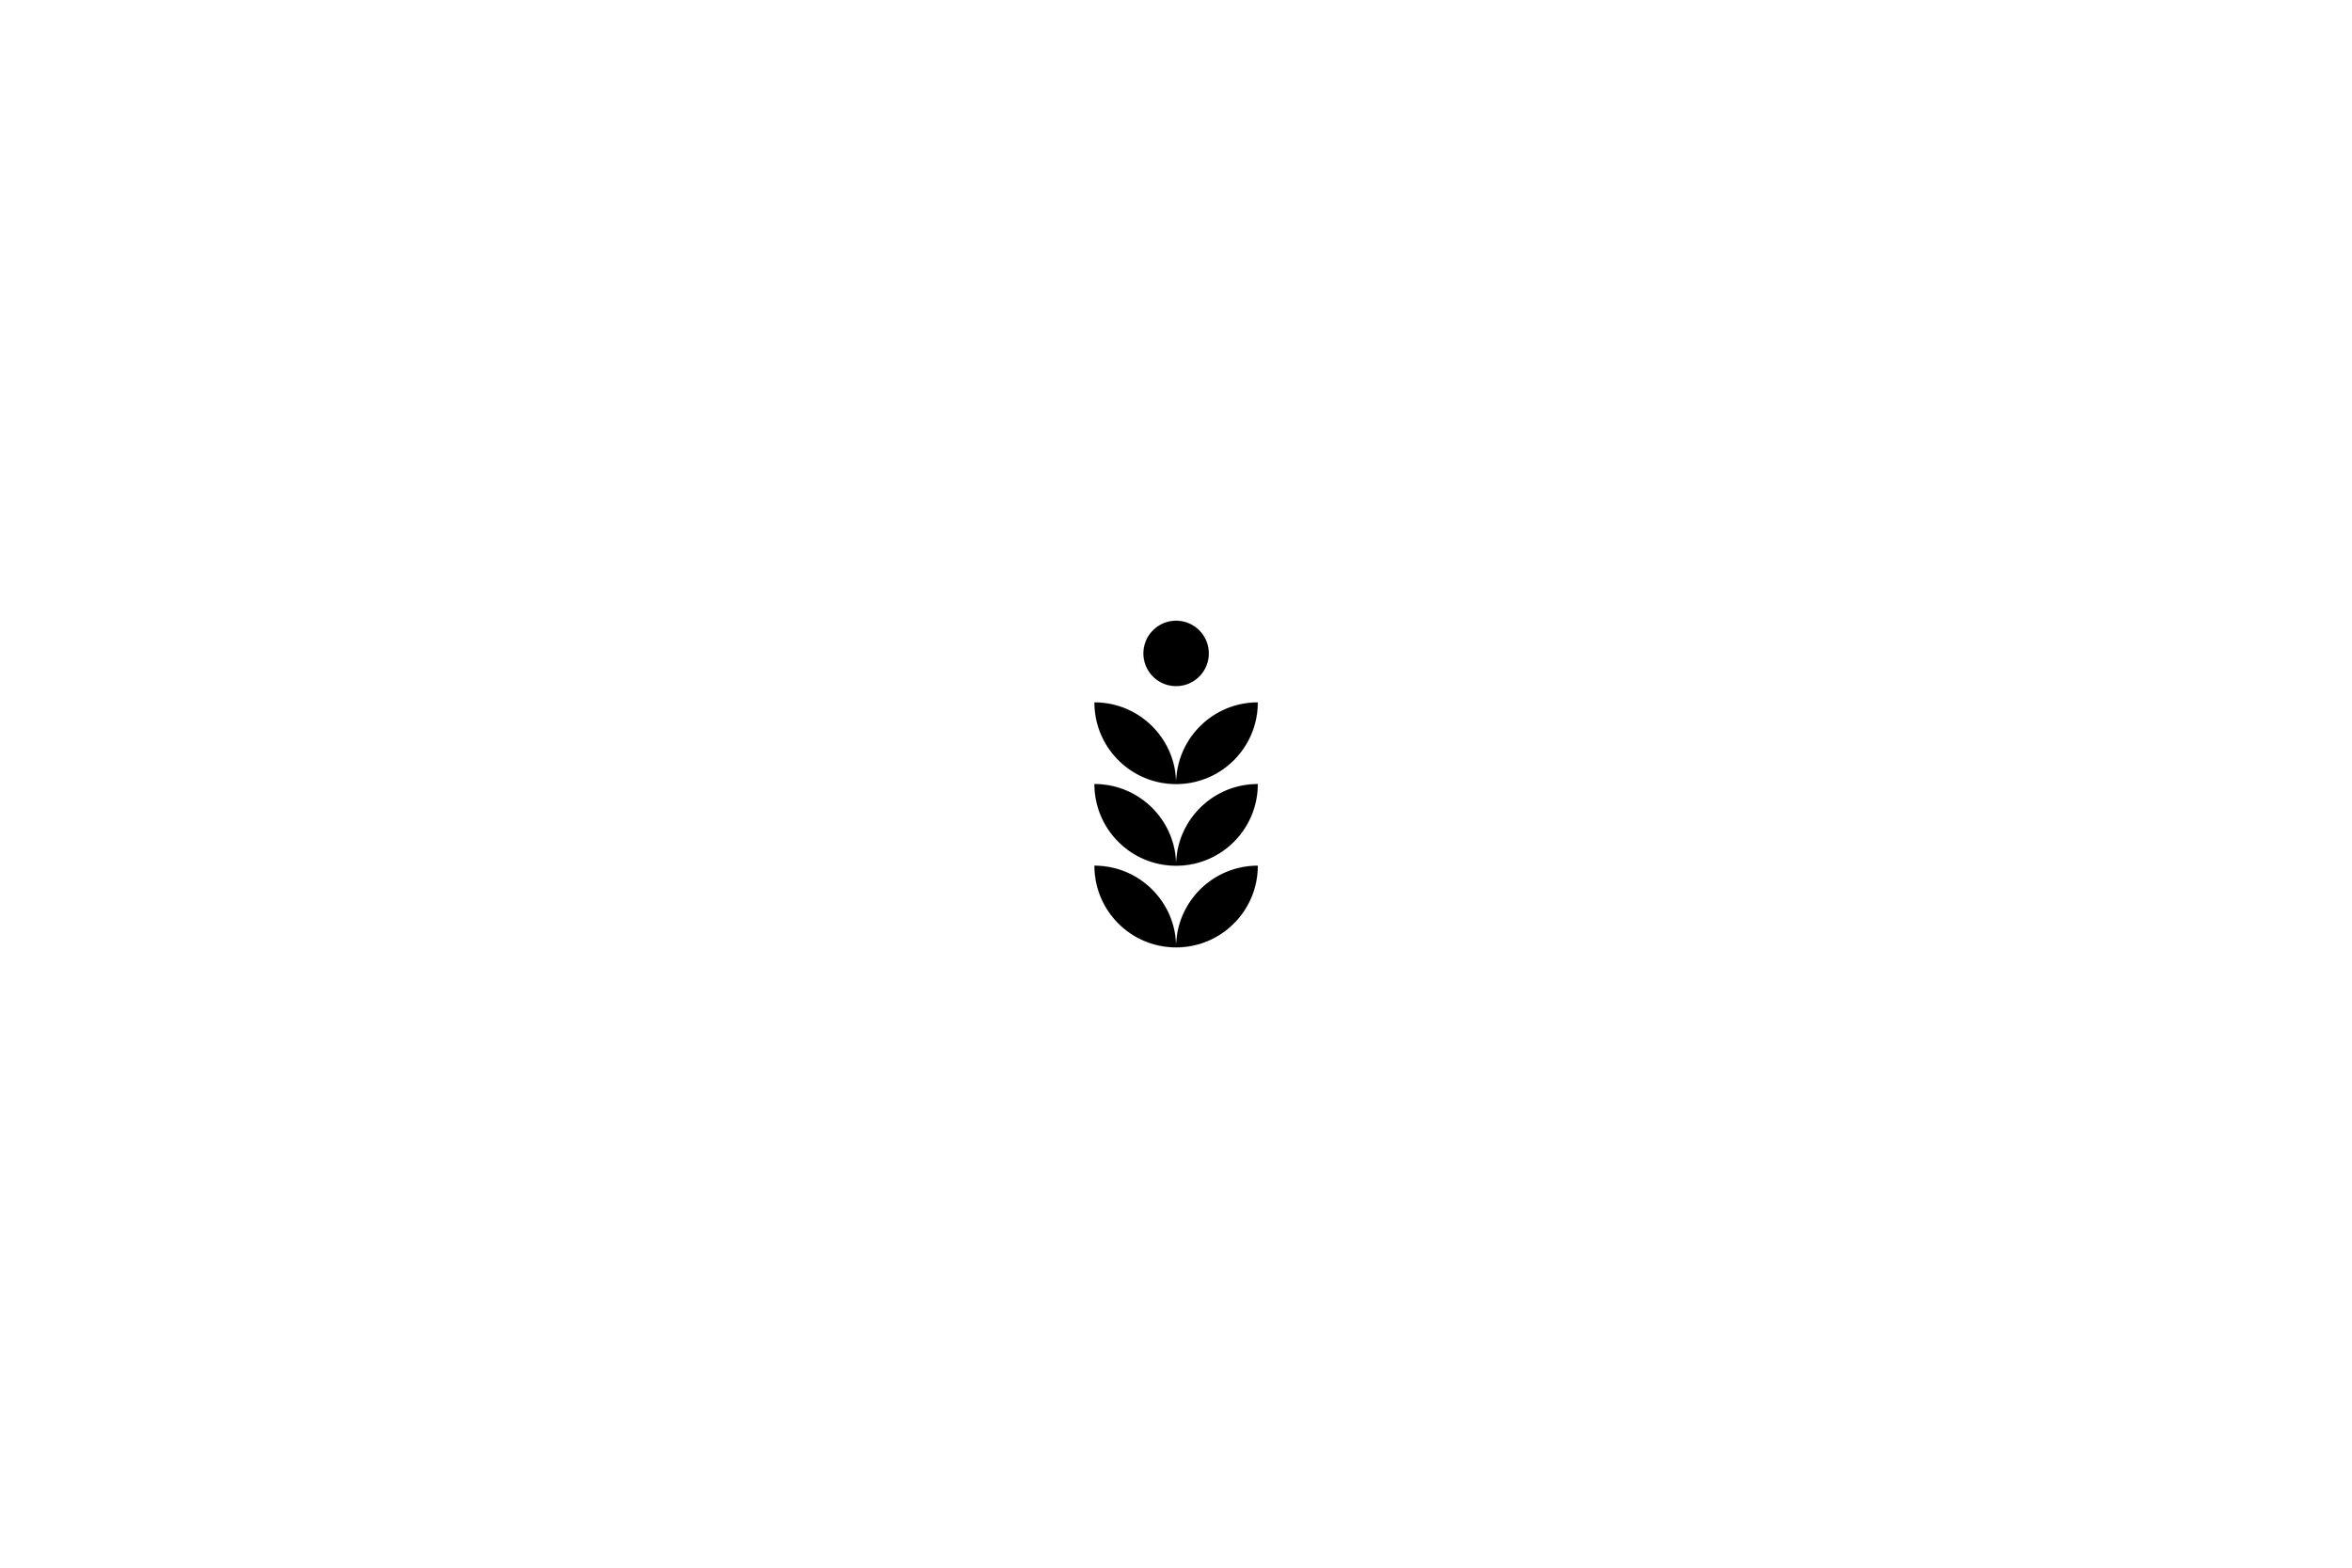 vortic_facebook_logocollection2-14